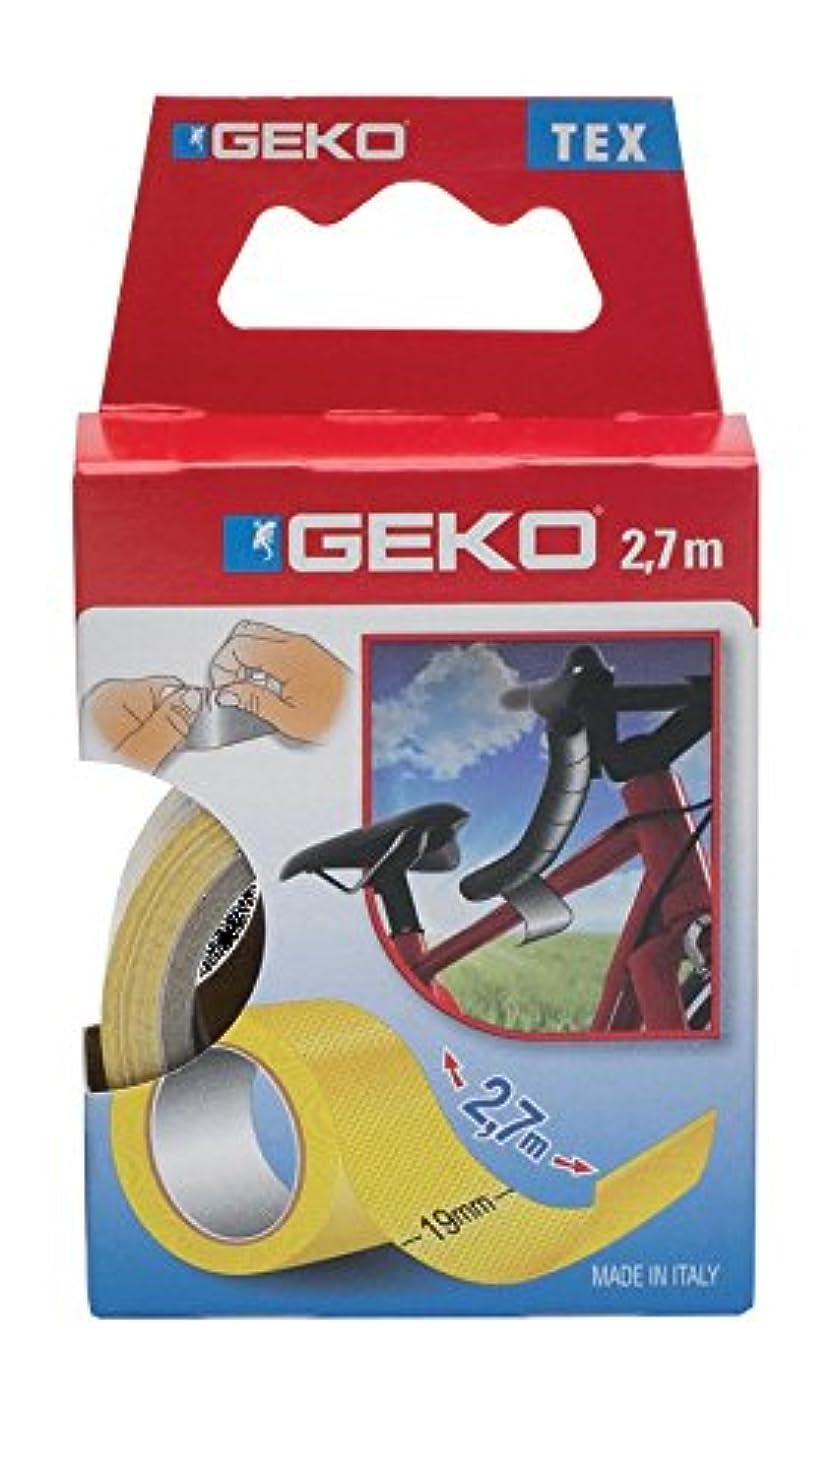 Geko 14300/26 - Adhesive Tape (38 mm x 2.7 m)